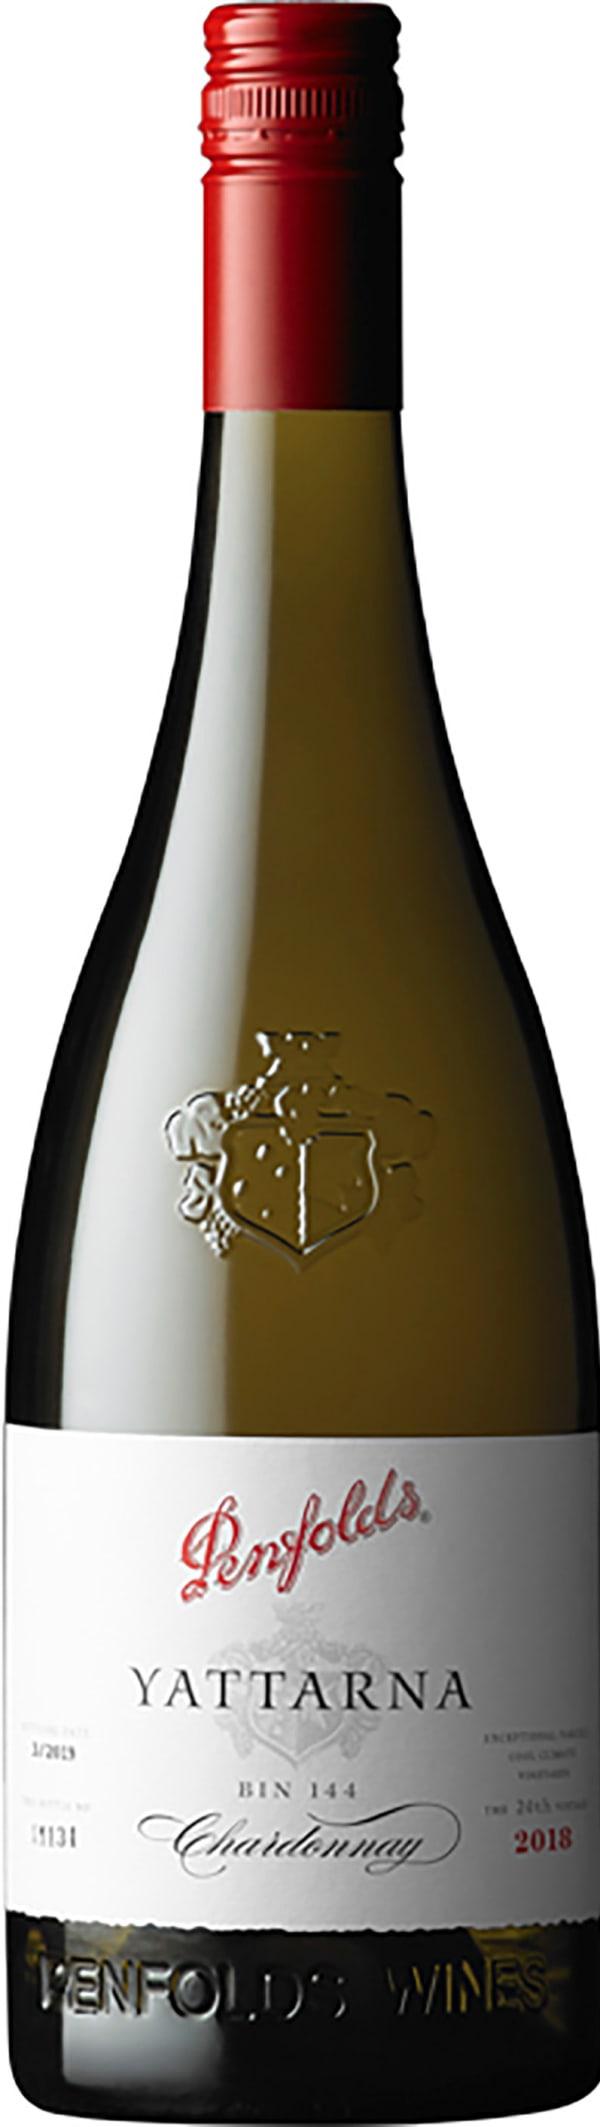 Penfolds Yattarna Chardonnay Bin 144 2018